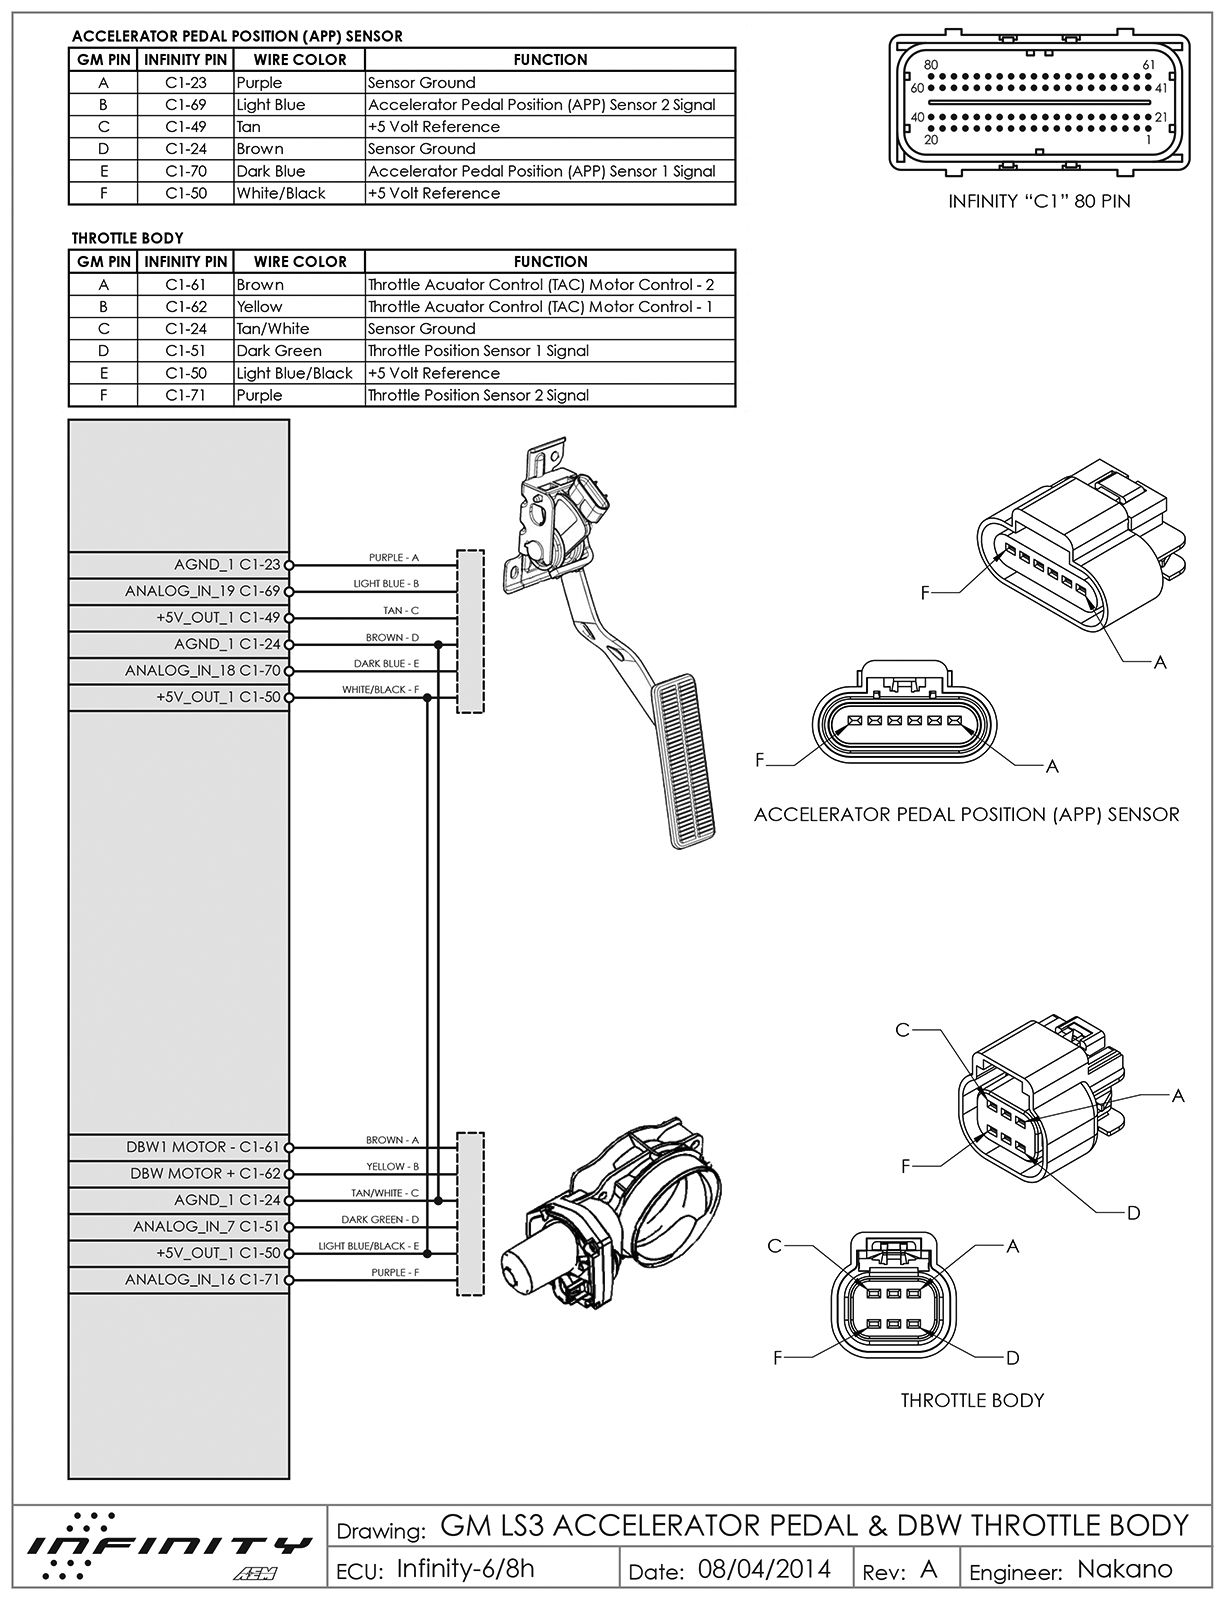 medium resolution of tps wiring diagram for ls3 wiring diagram meta nissan tps wiring diagram